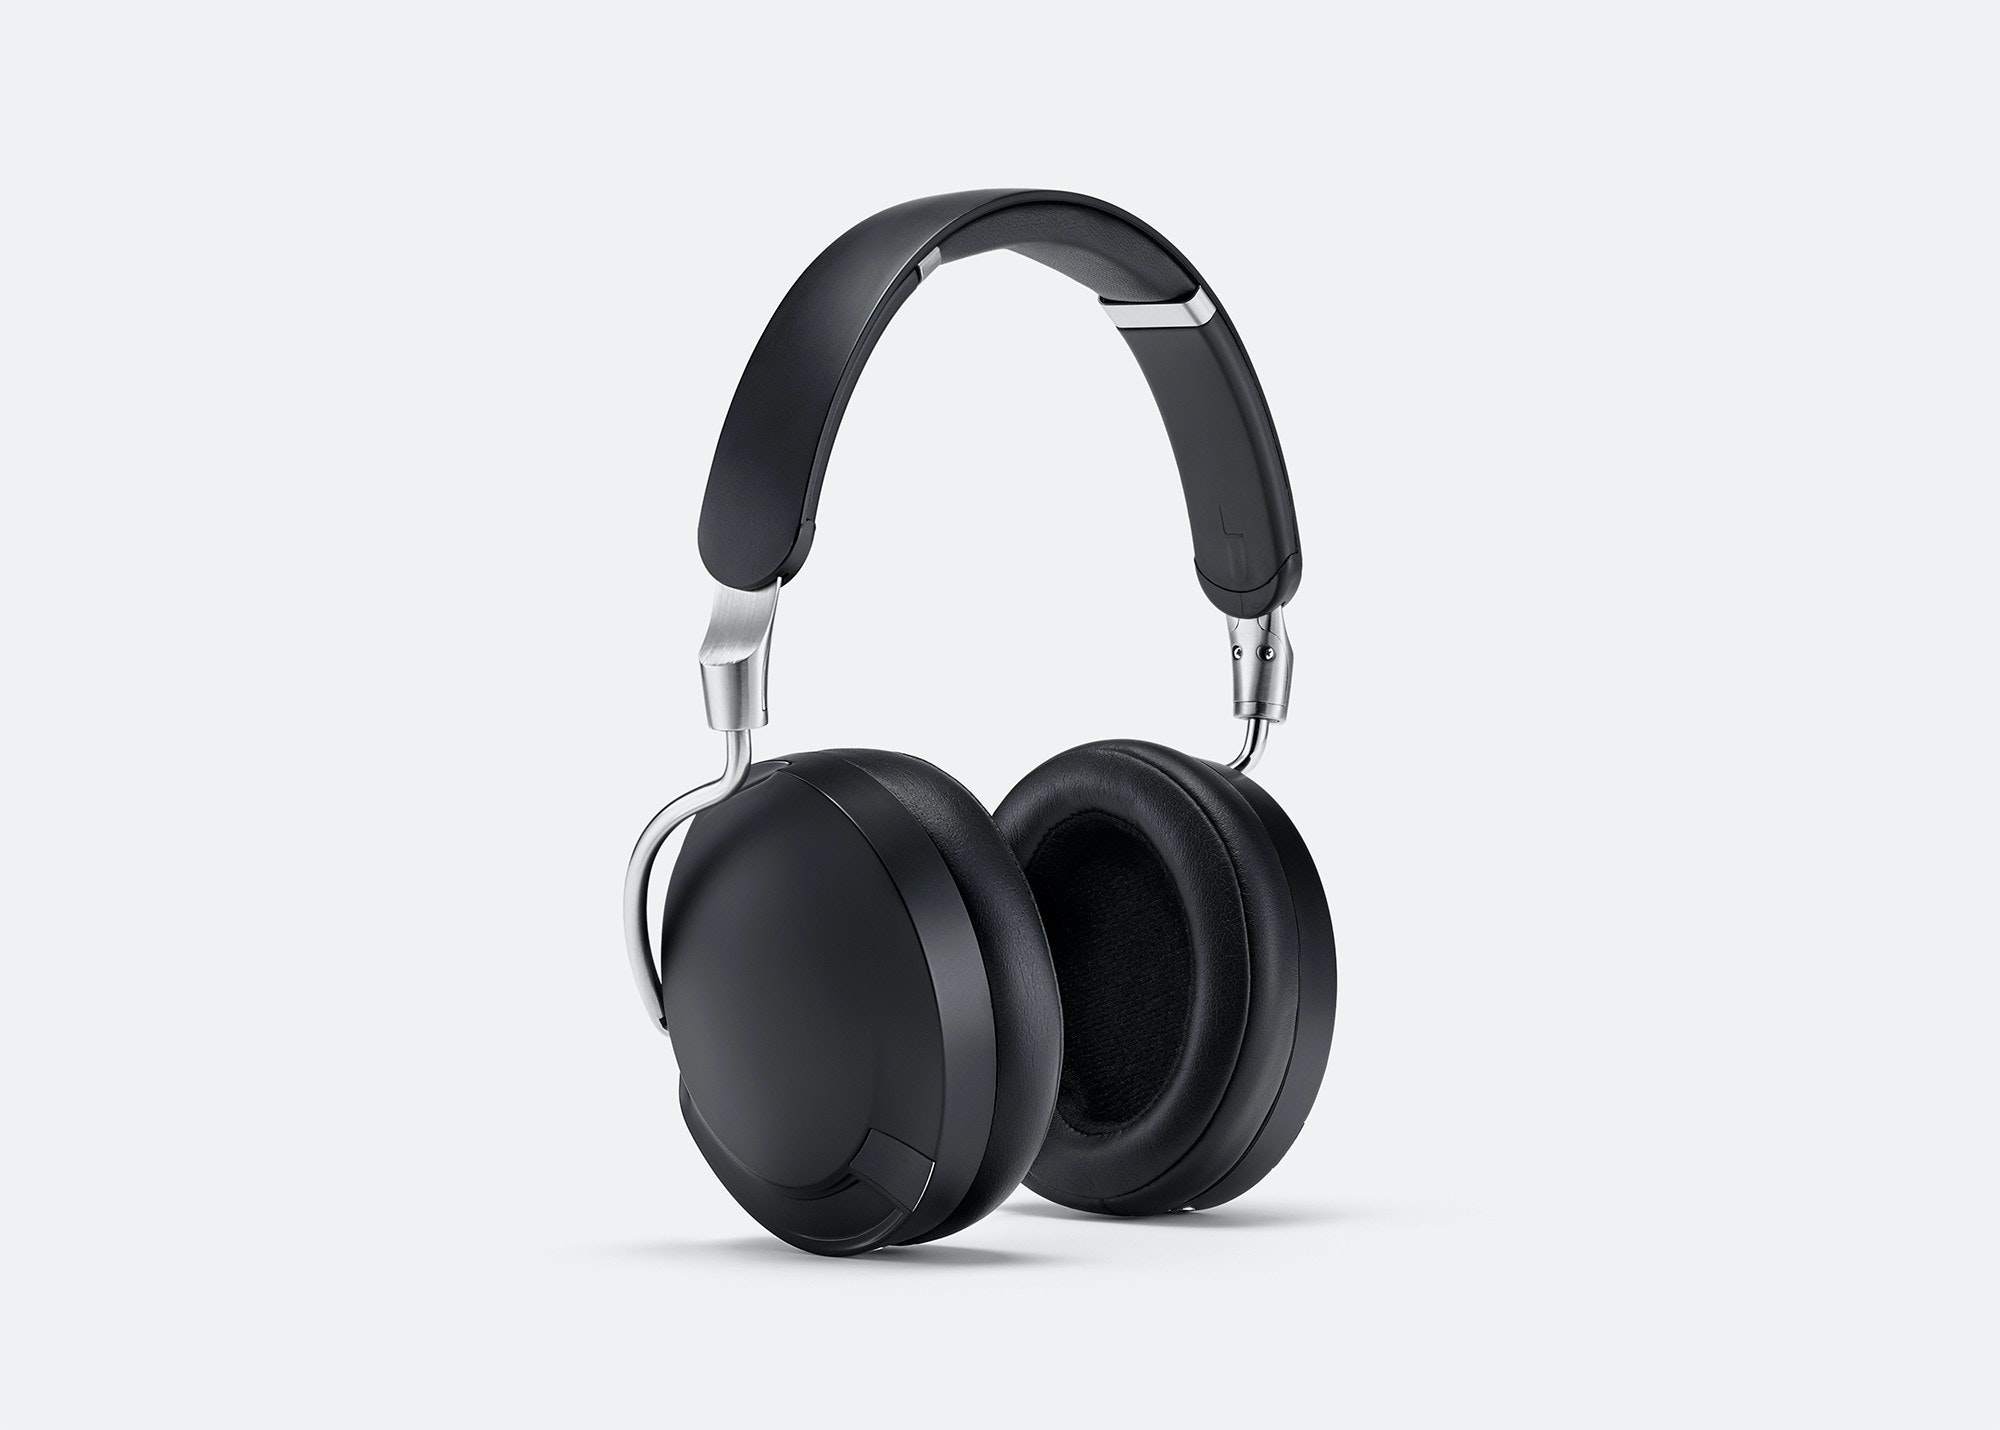 HD Two Headphones by Status Audio